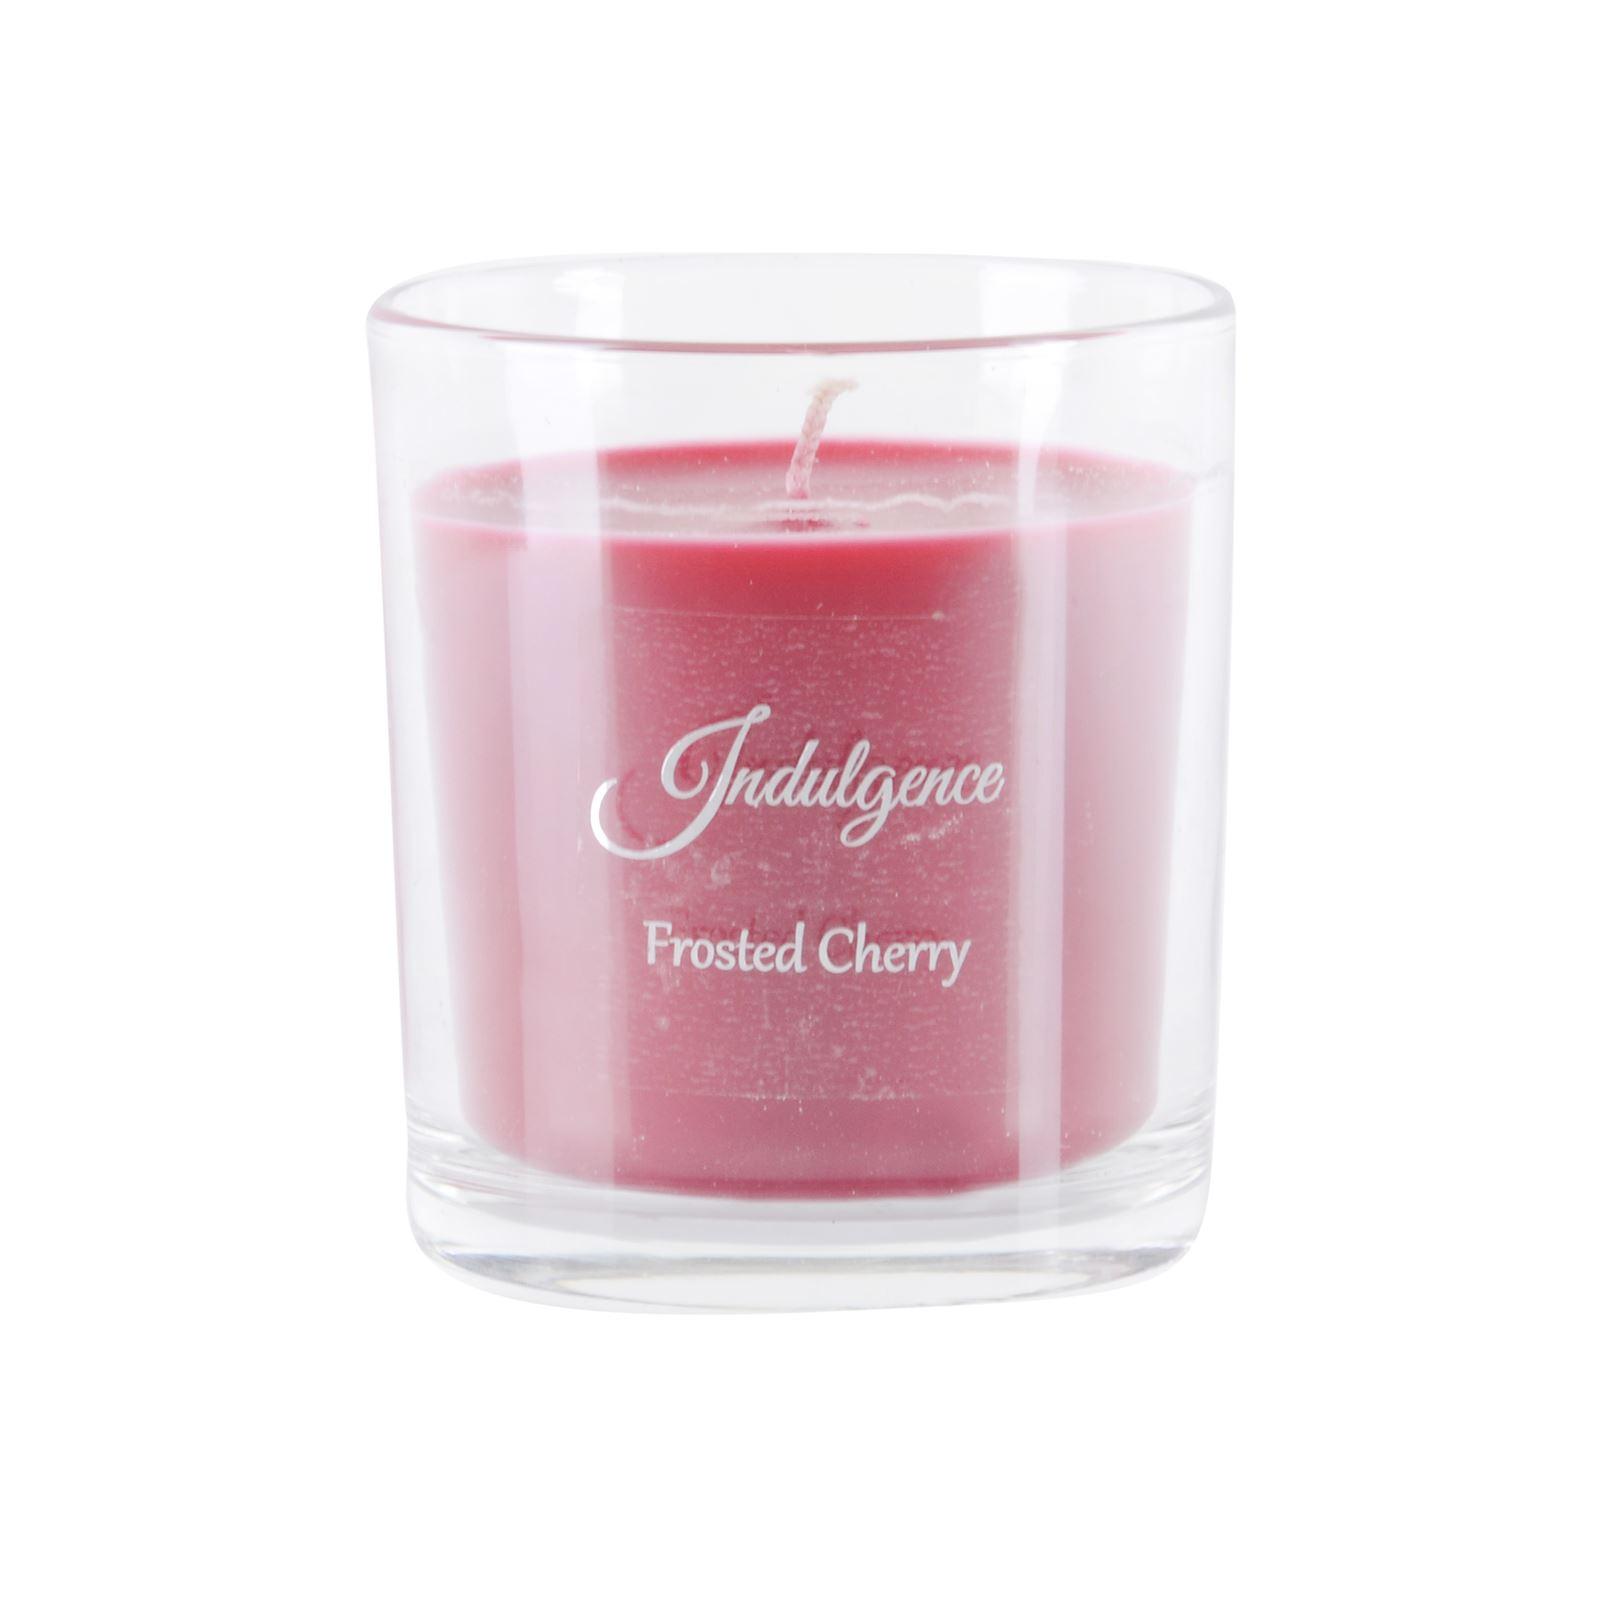 New Baltus 35 Hour Scented Jar Candle Mulled Wine Vanilla Apple Cinnamon Cherry